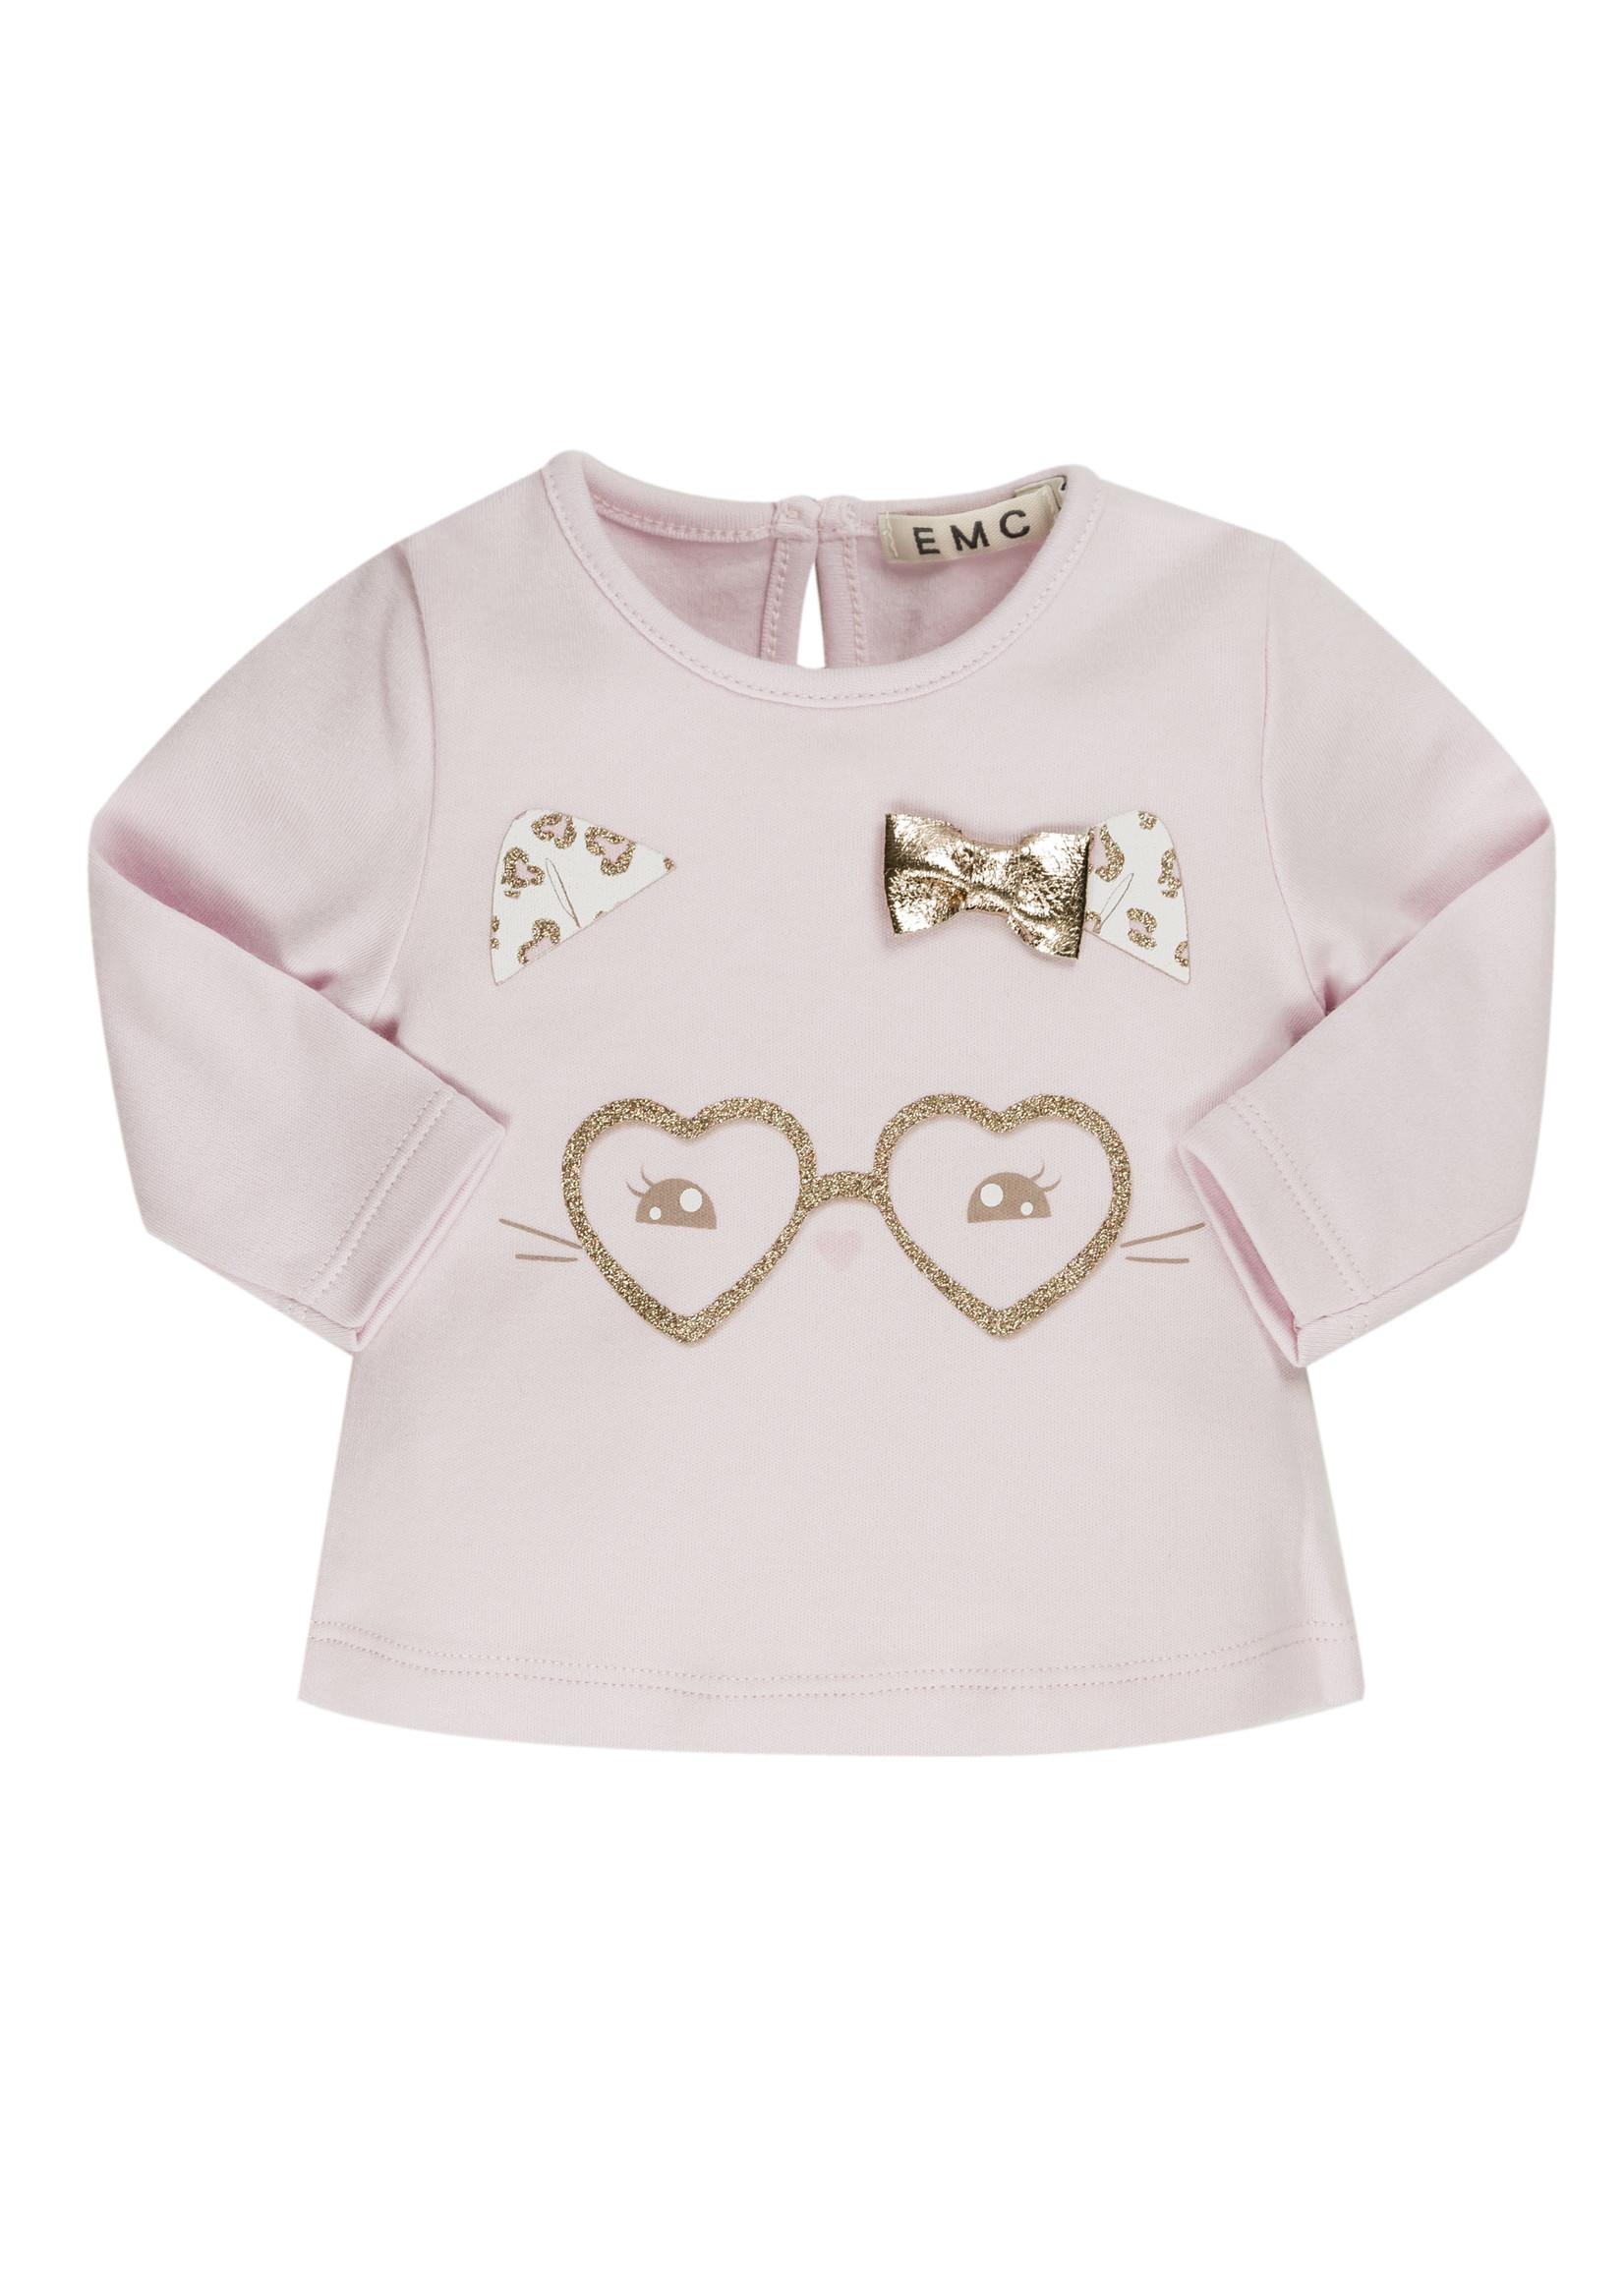 EMC EMC hearts glasses shirt pink